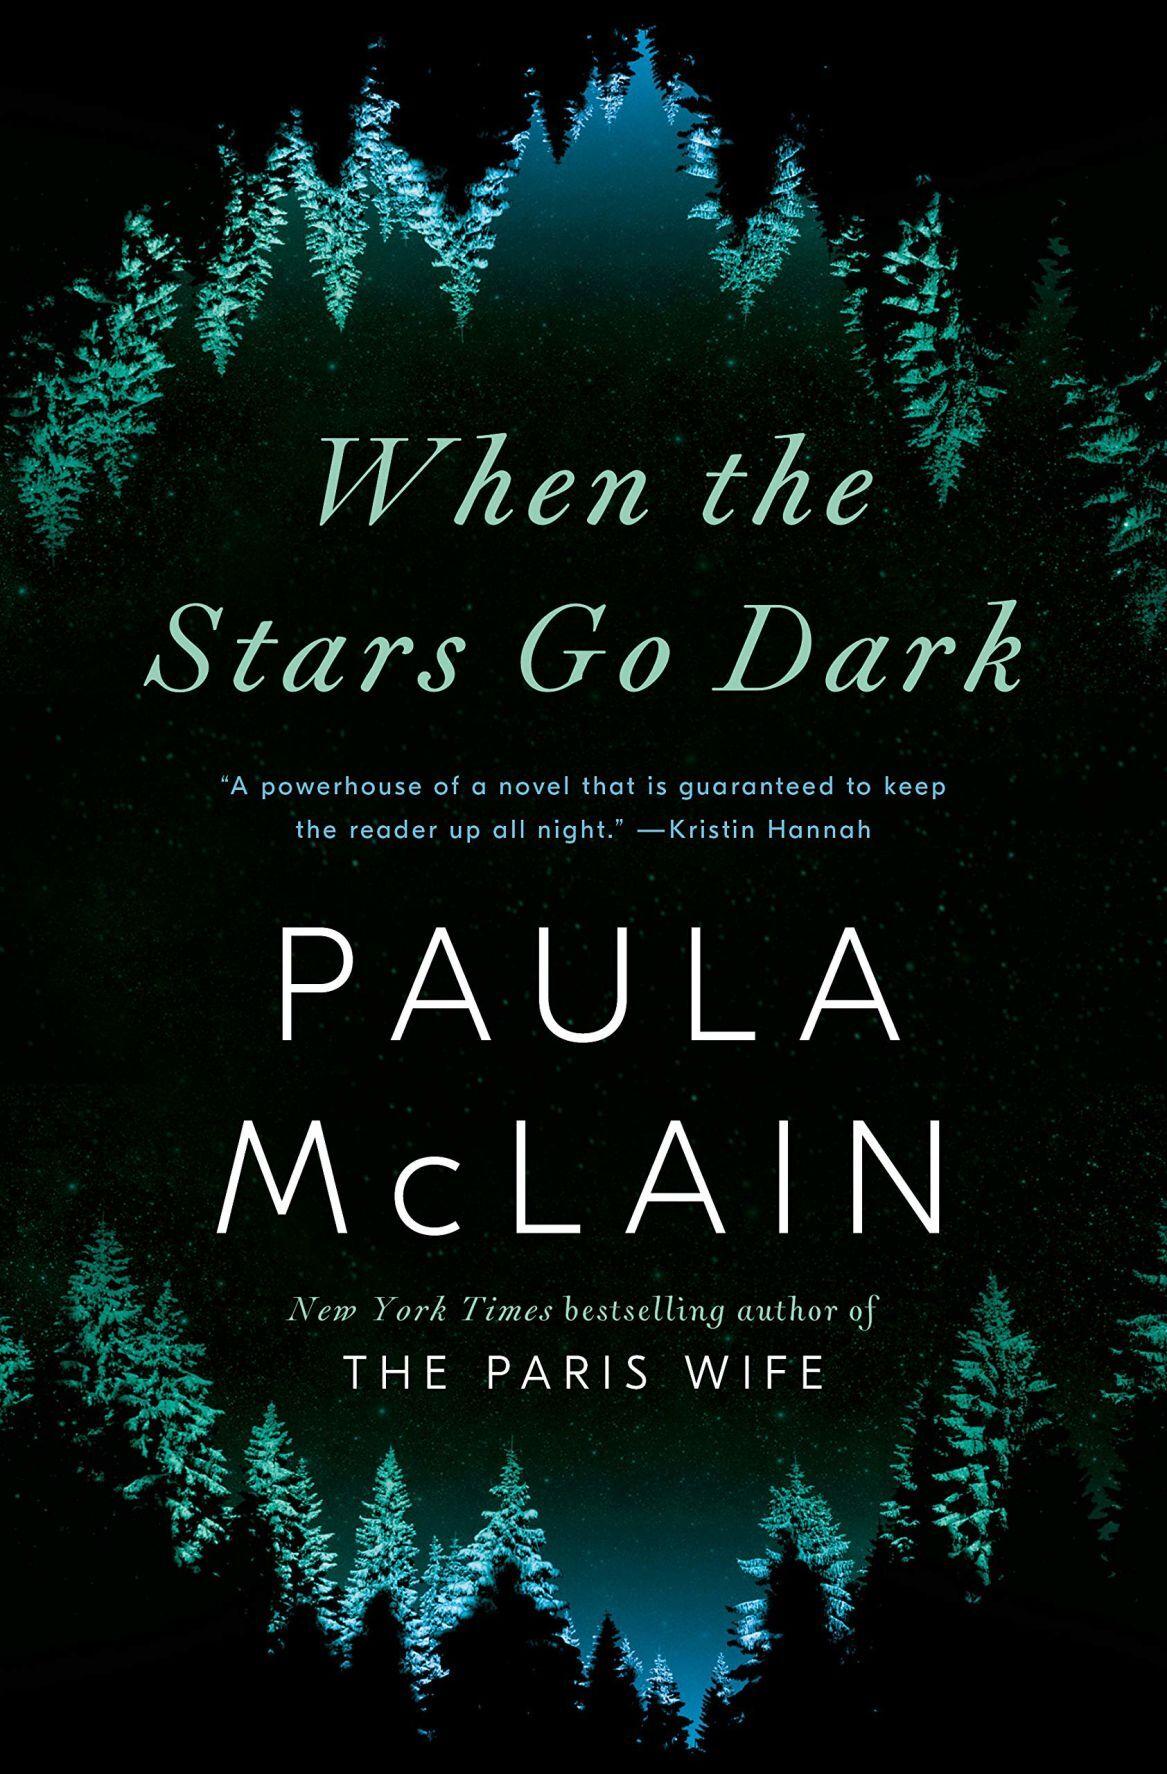 """When the Stars Go Dark"" by Paula McLain"